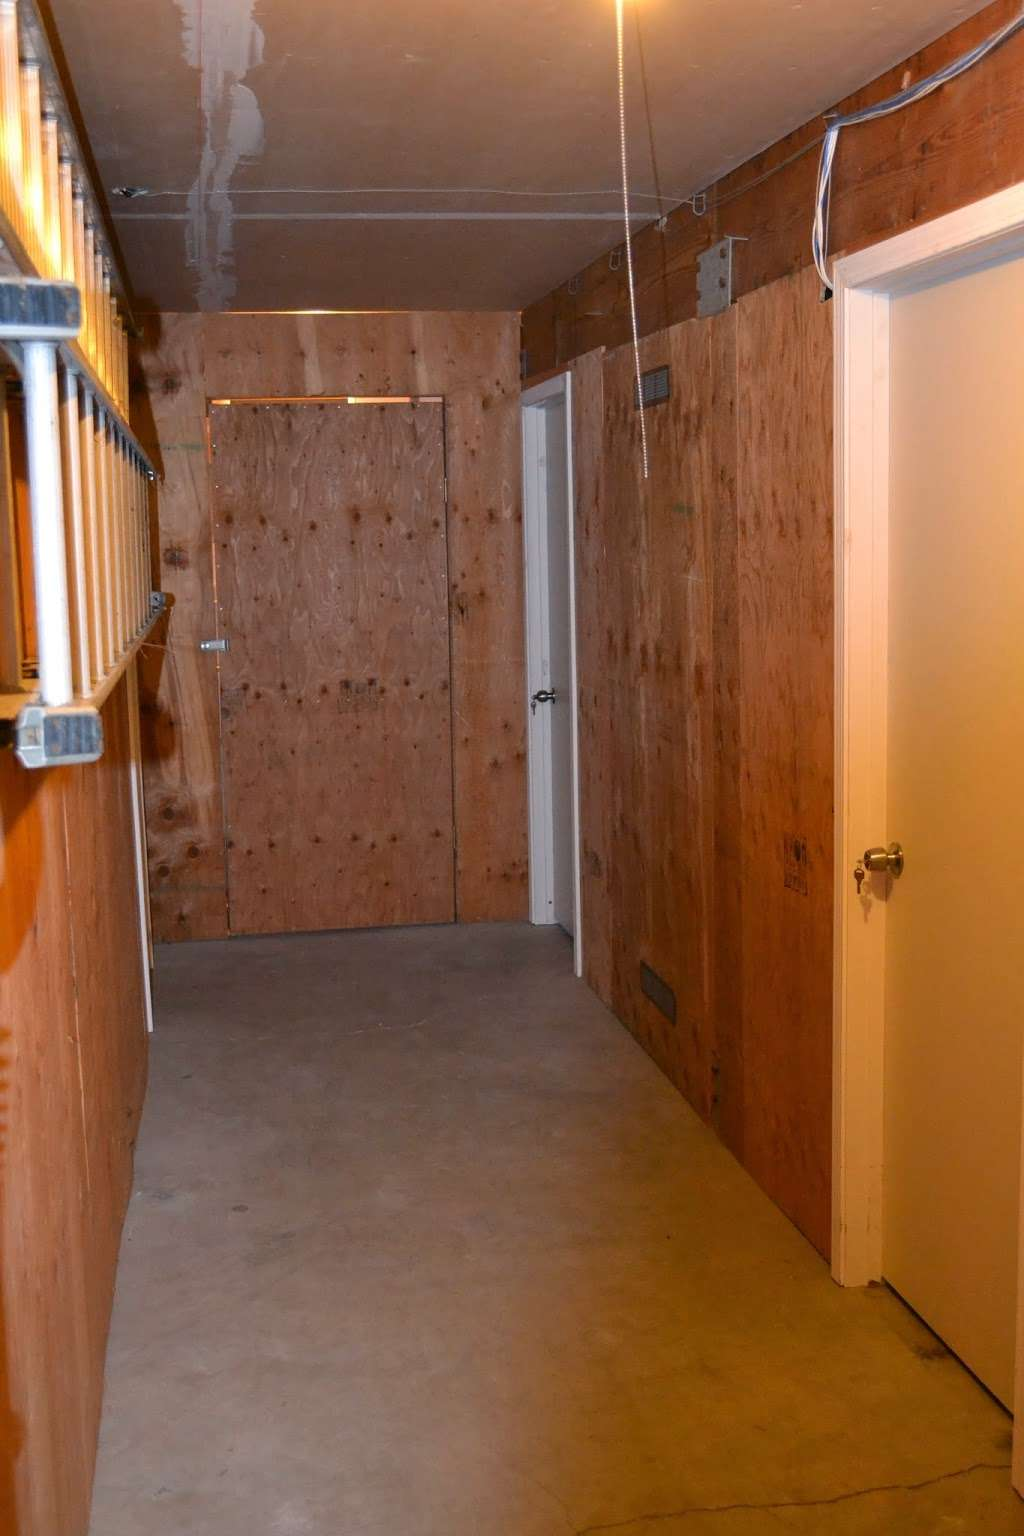 BND Properties - storage  | Photo 1 of 3 | Address: 1024 Country Club Dr, Moraga, CA 94556, USA | Phone: (925) 376-2195